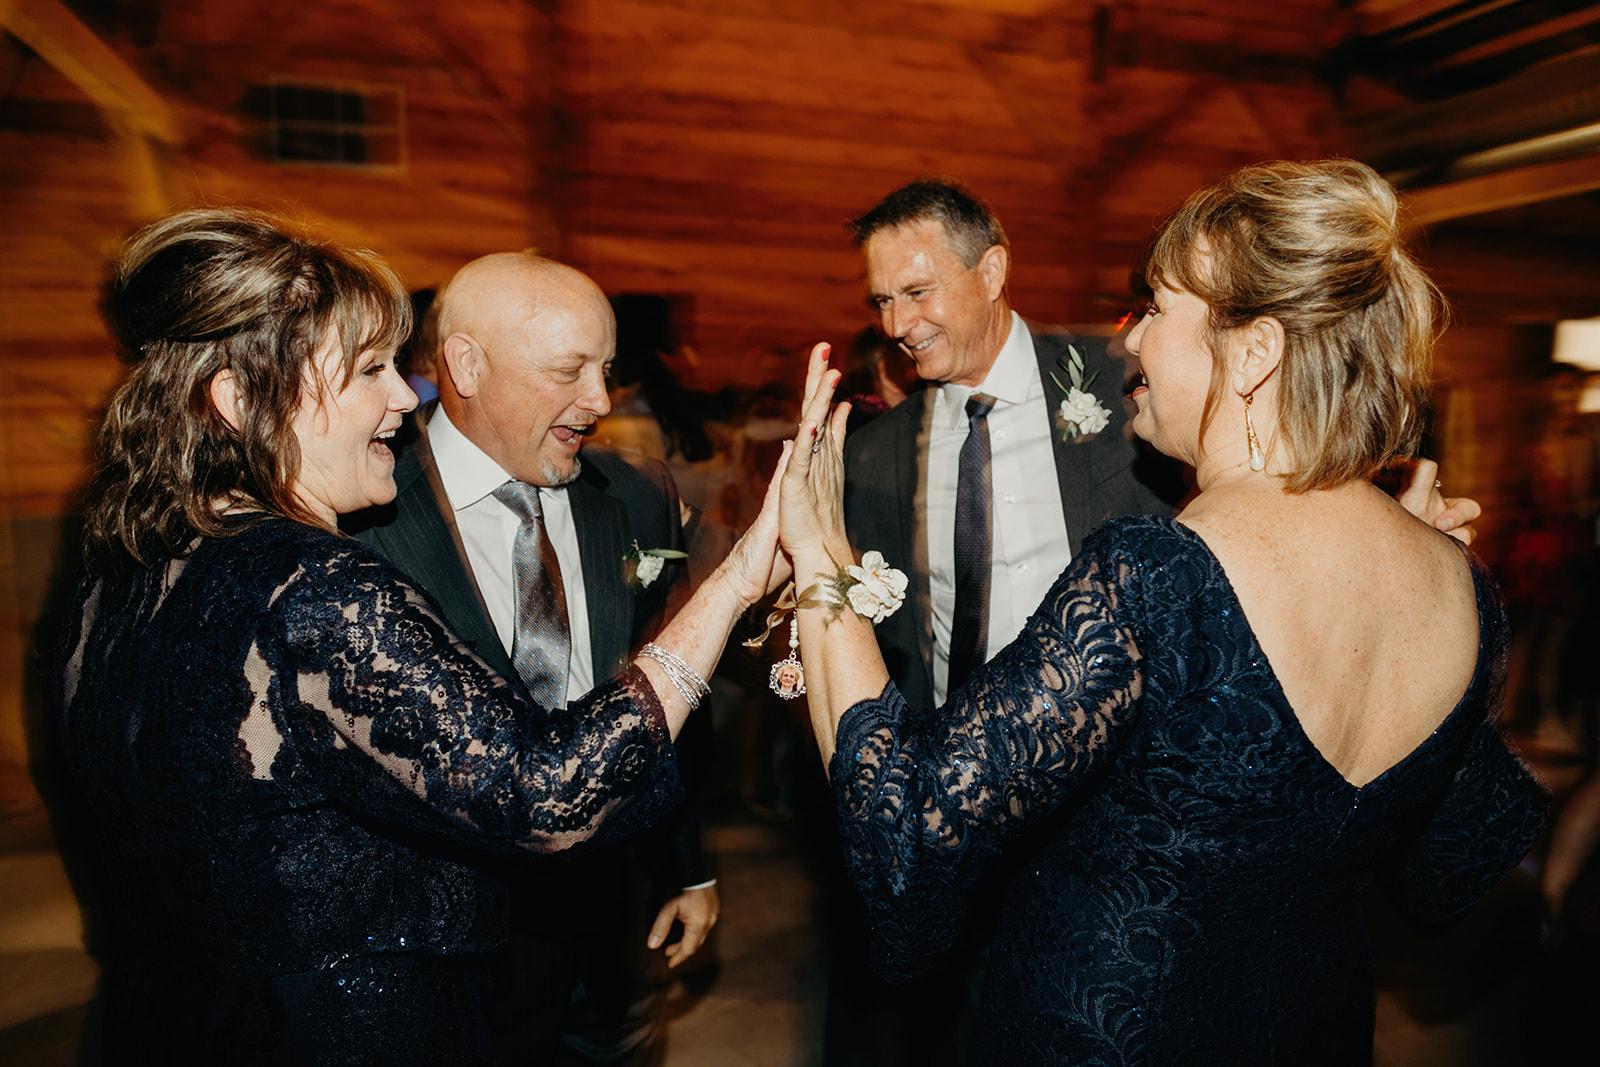 austin-wedding-lindsey-bryce-960.jpg